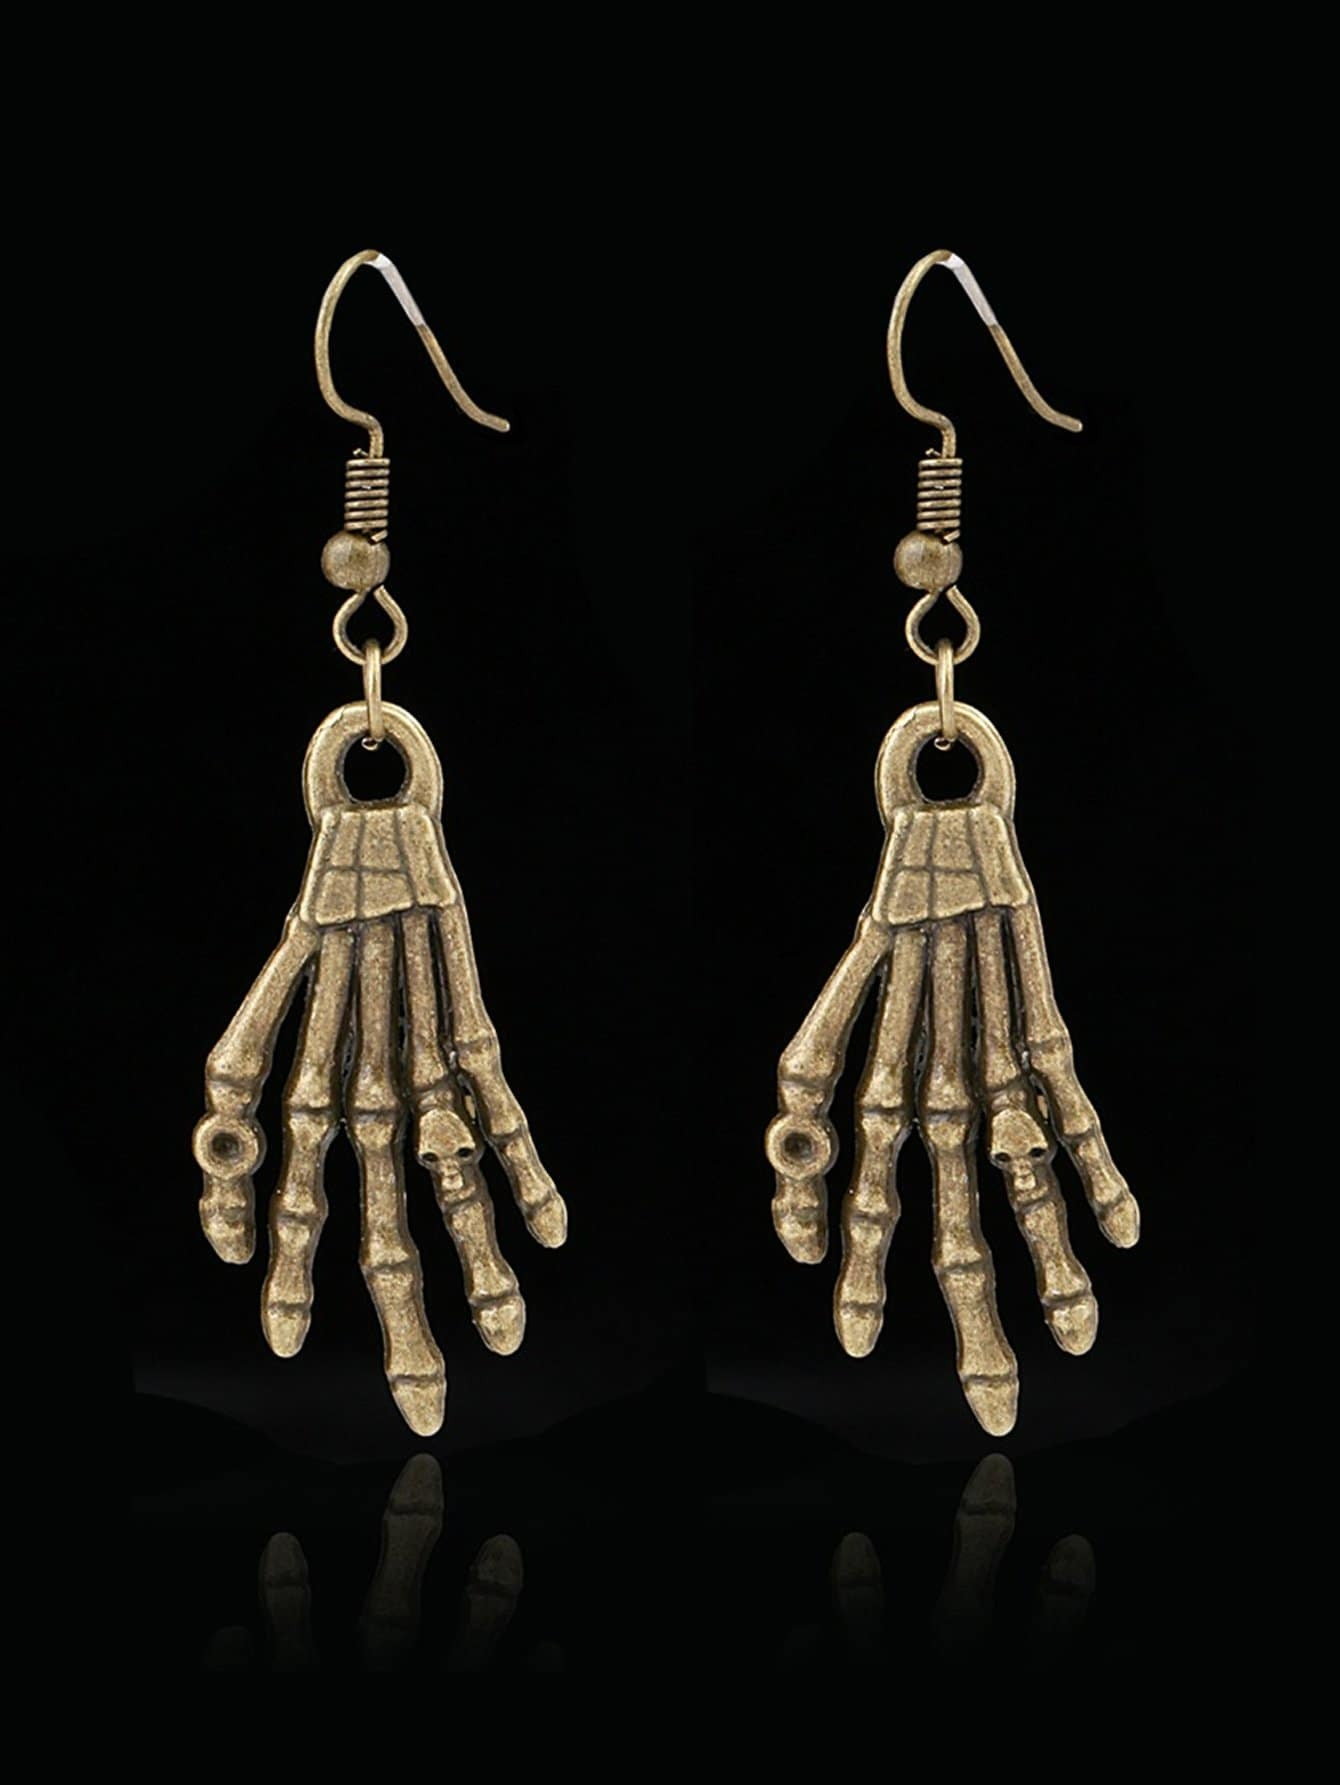 Skeleton Hand Design Drop Earrings